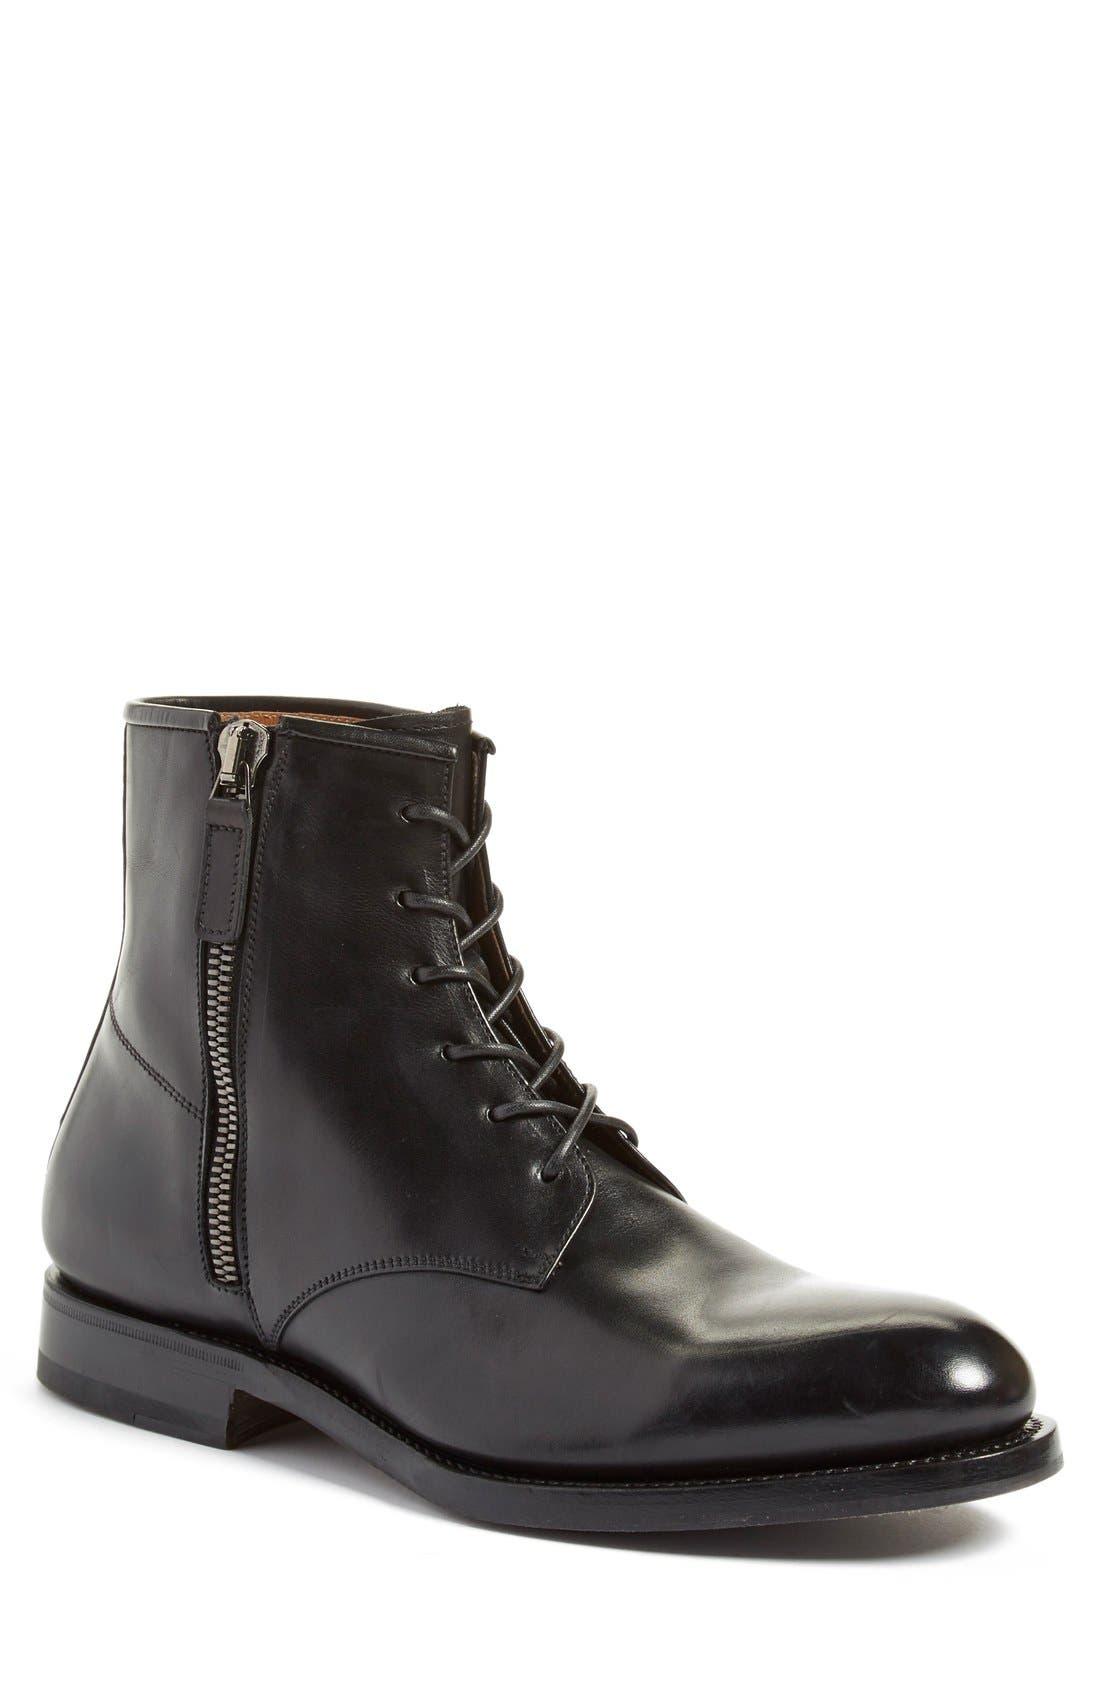 Main Image - Aquatalia 'Victor' Plain Toe Boot (Men)